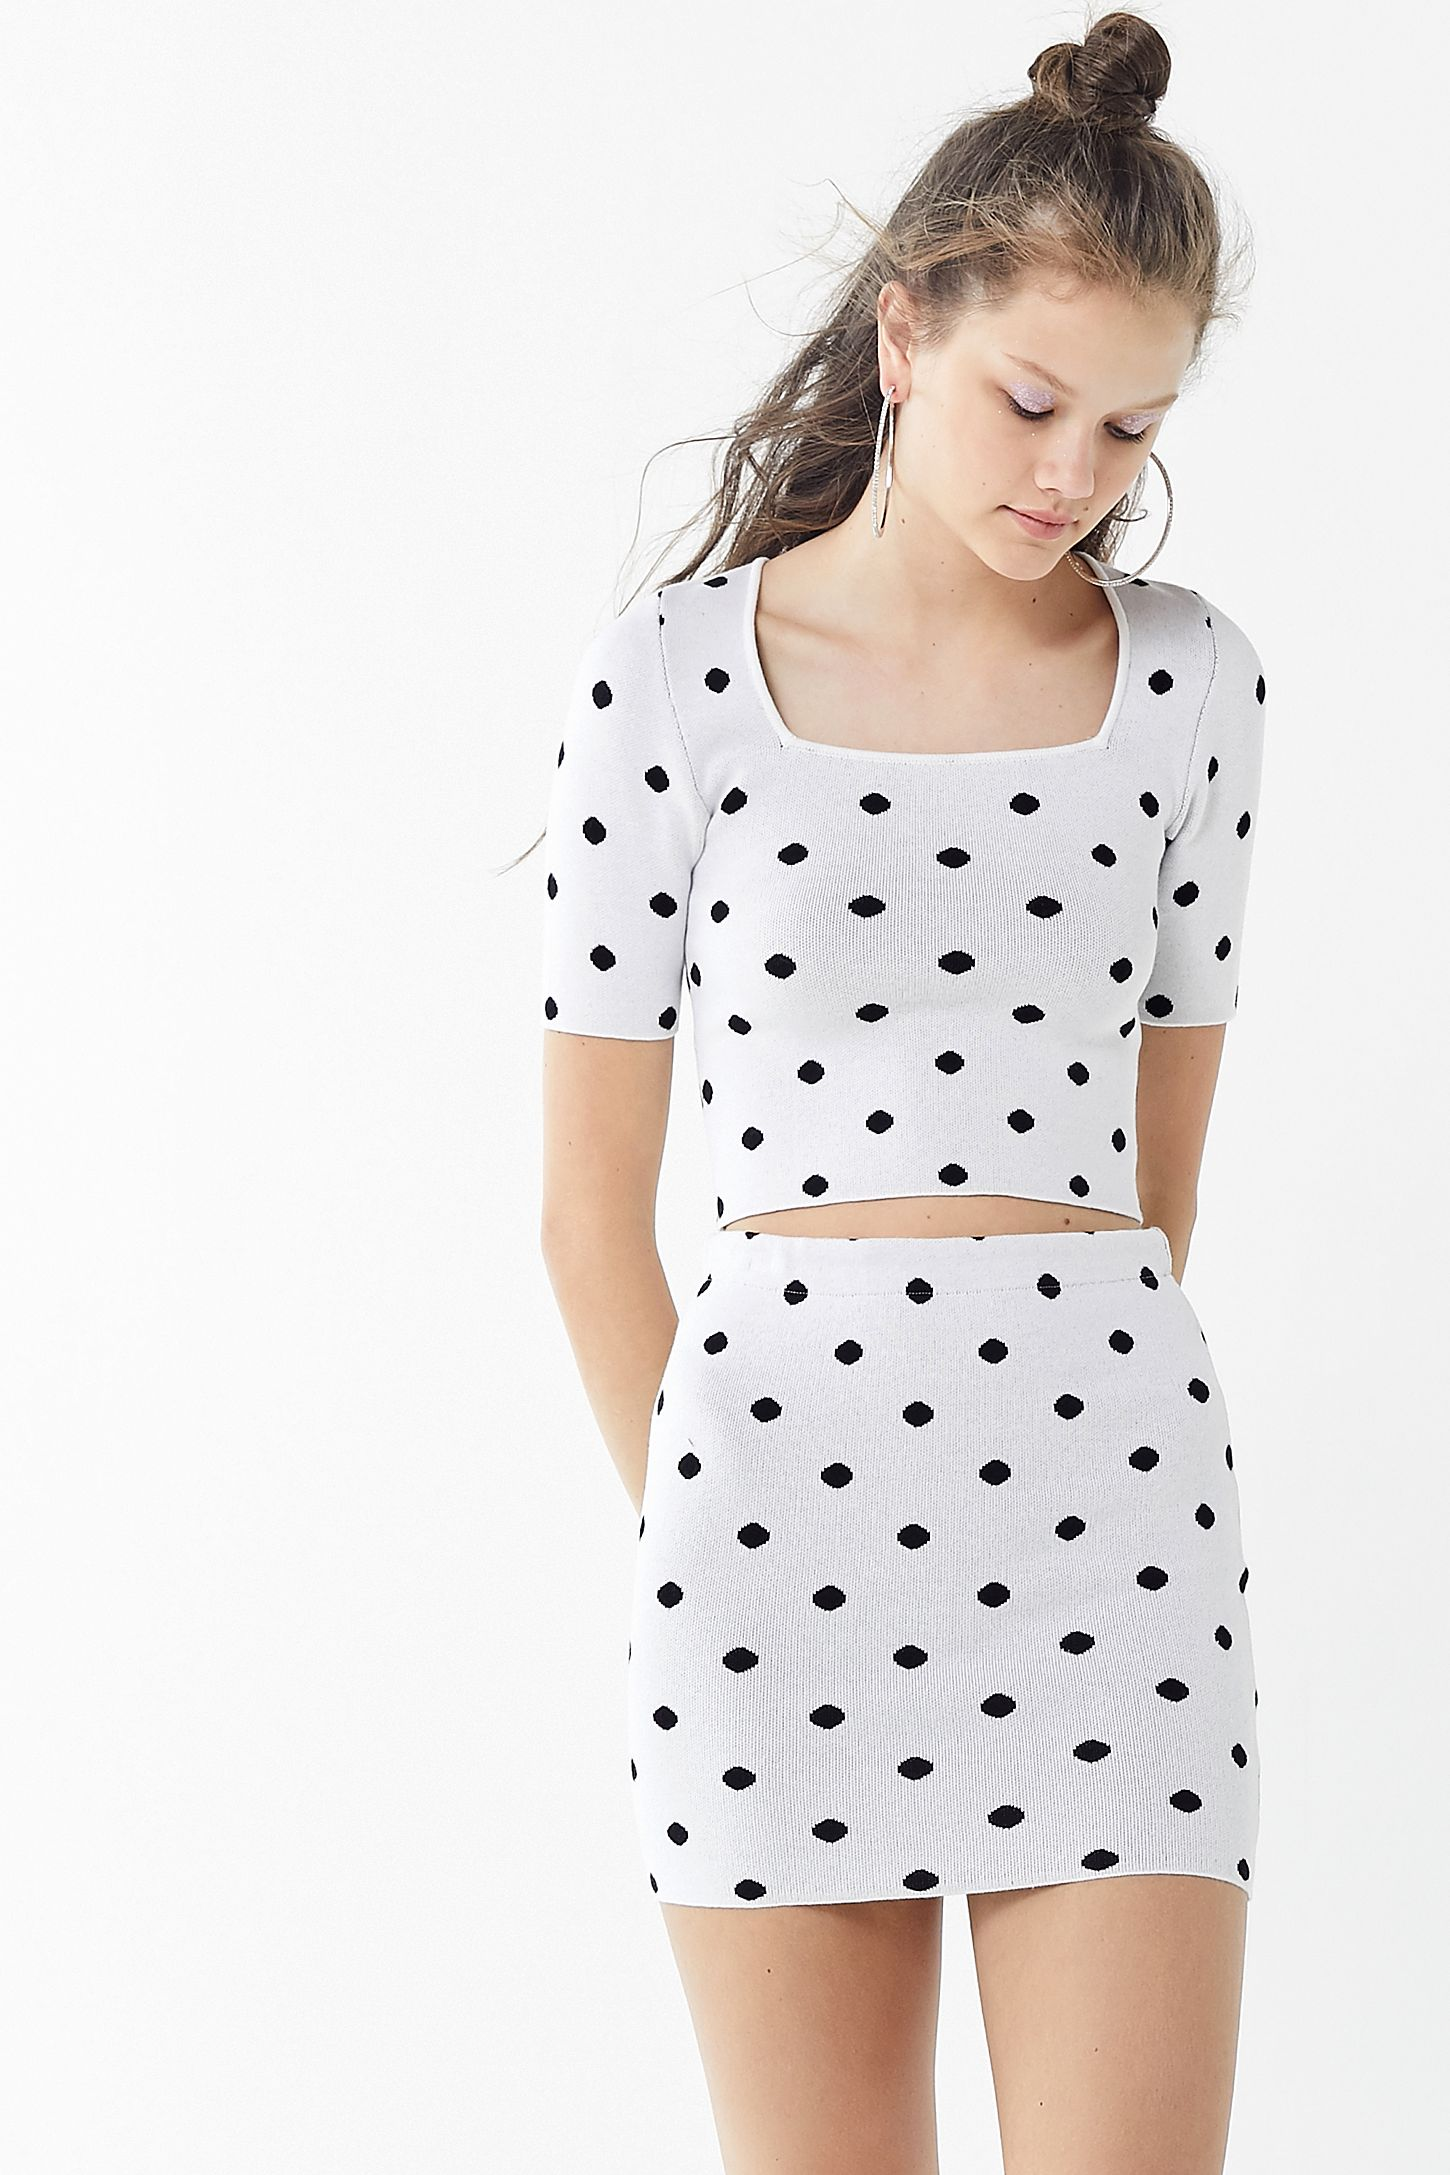 7ddd61141f UO Polka Dot Bodycon Mini Skirt